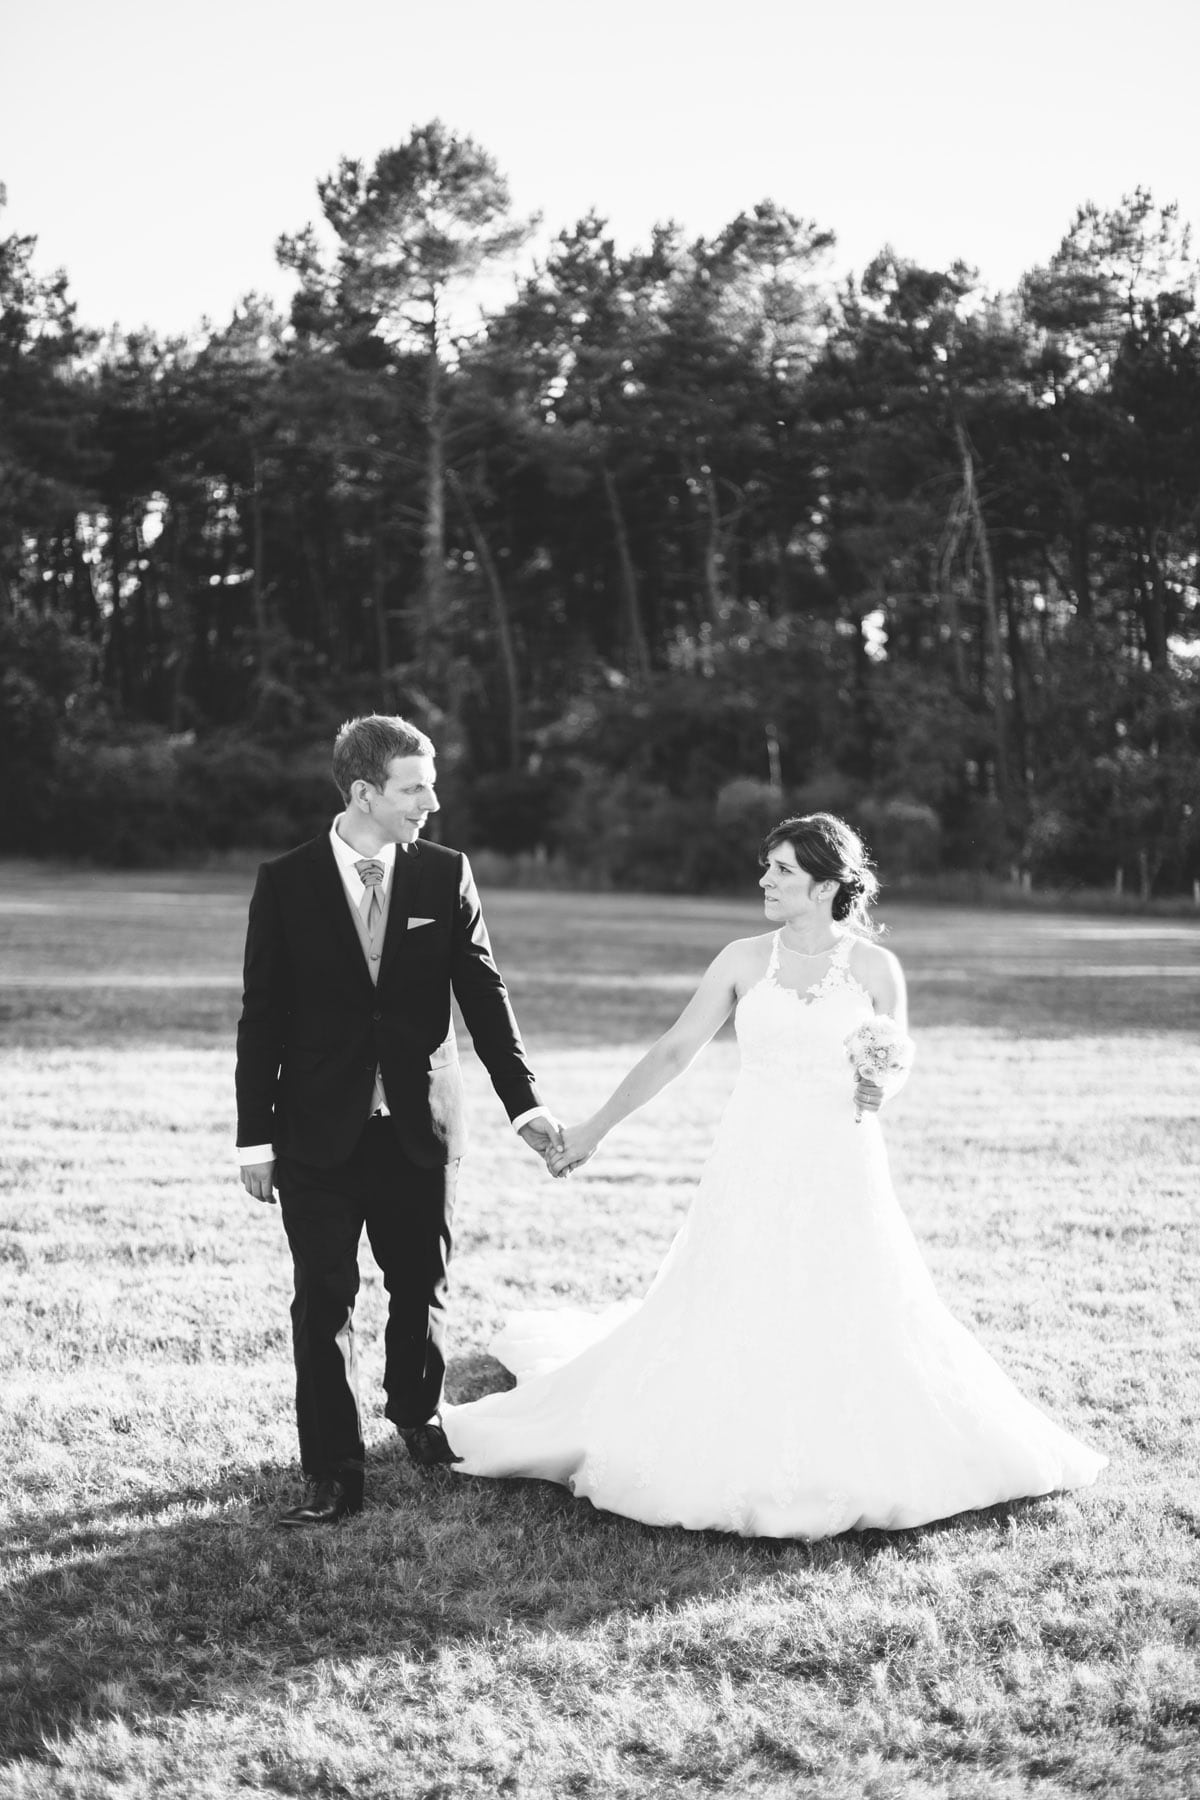 photographe mariage bordeaux landes fineart francais sarah miramon blog 38